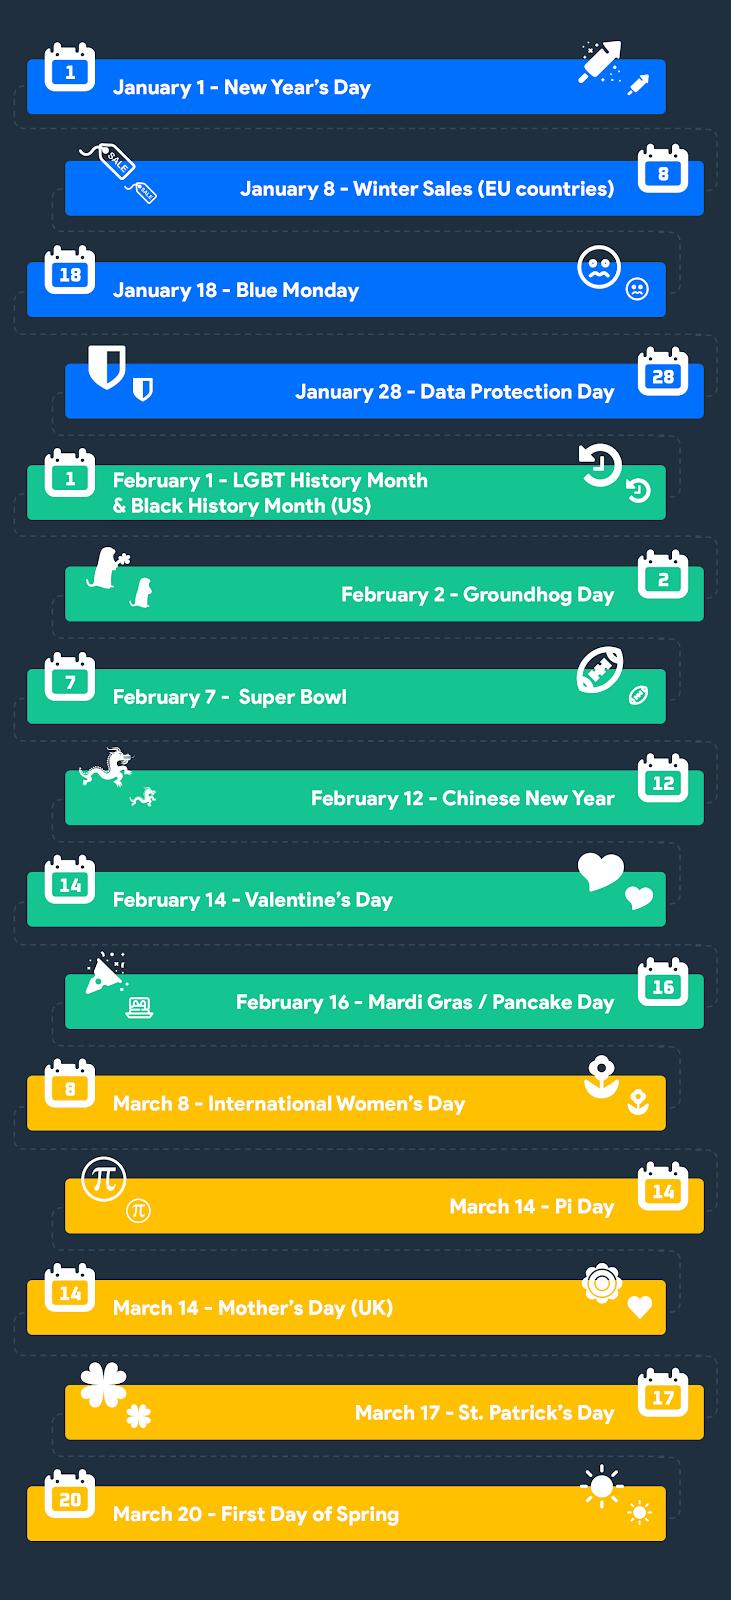 Key dates in 2021 - Affiliate marketing calendar(Q1: JANUARY - MARCH)